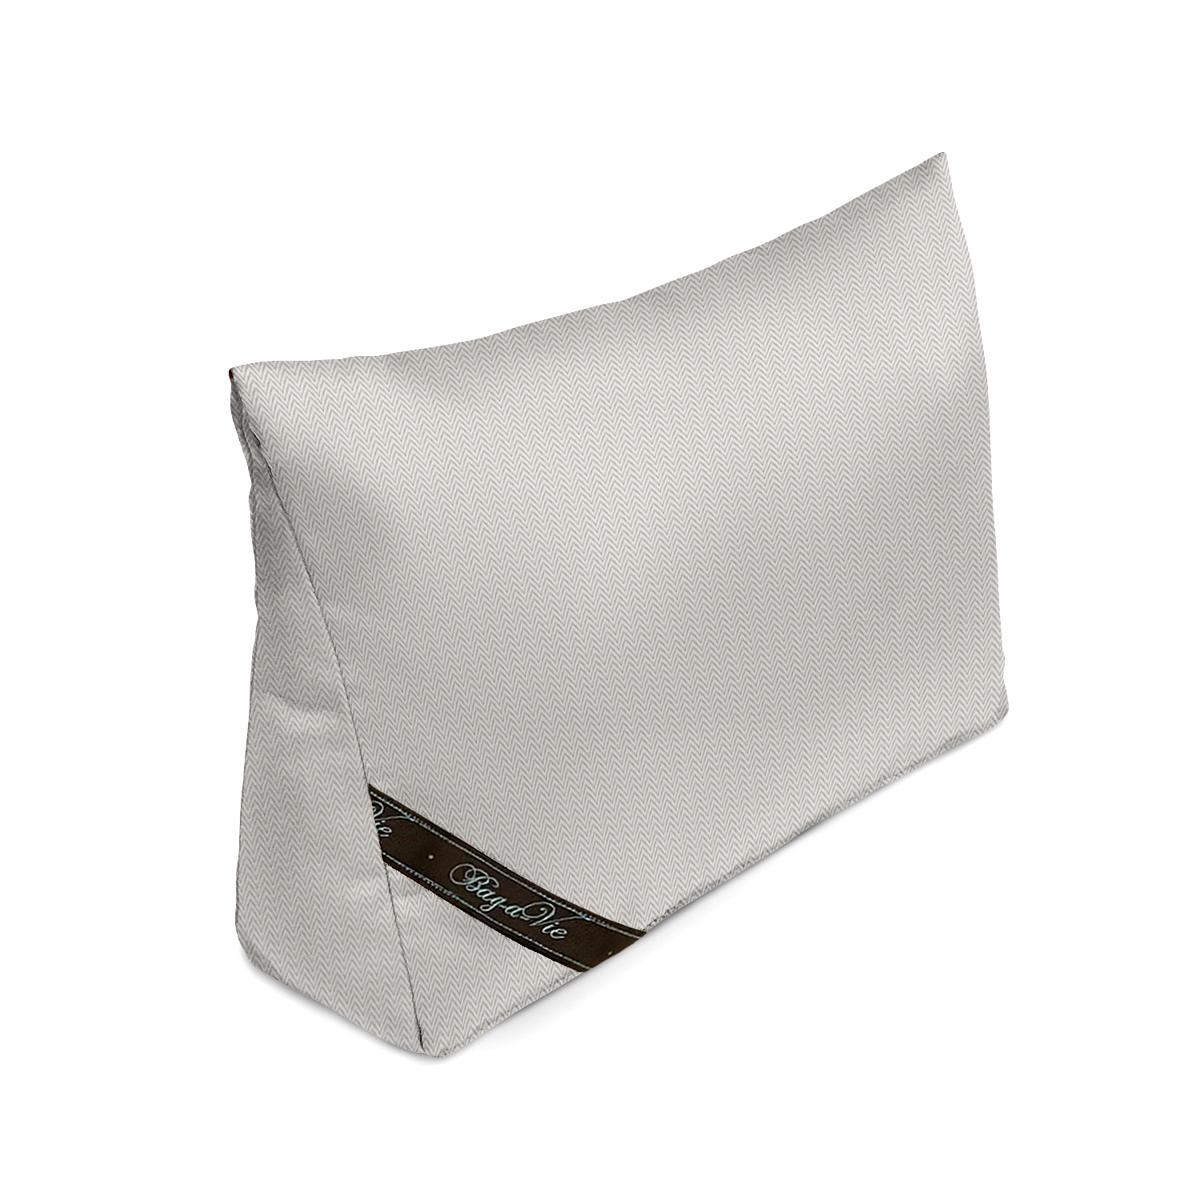 Custom Kelly 35 Handbag Storage Pillow Shaper